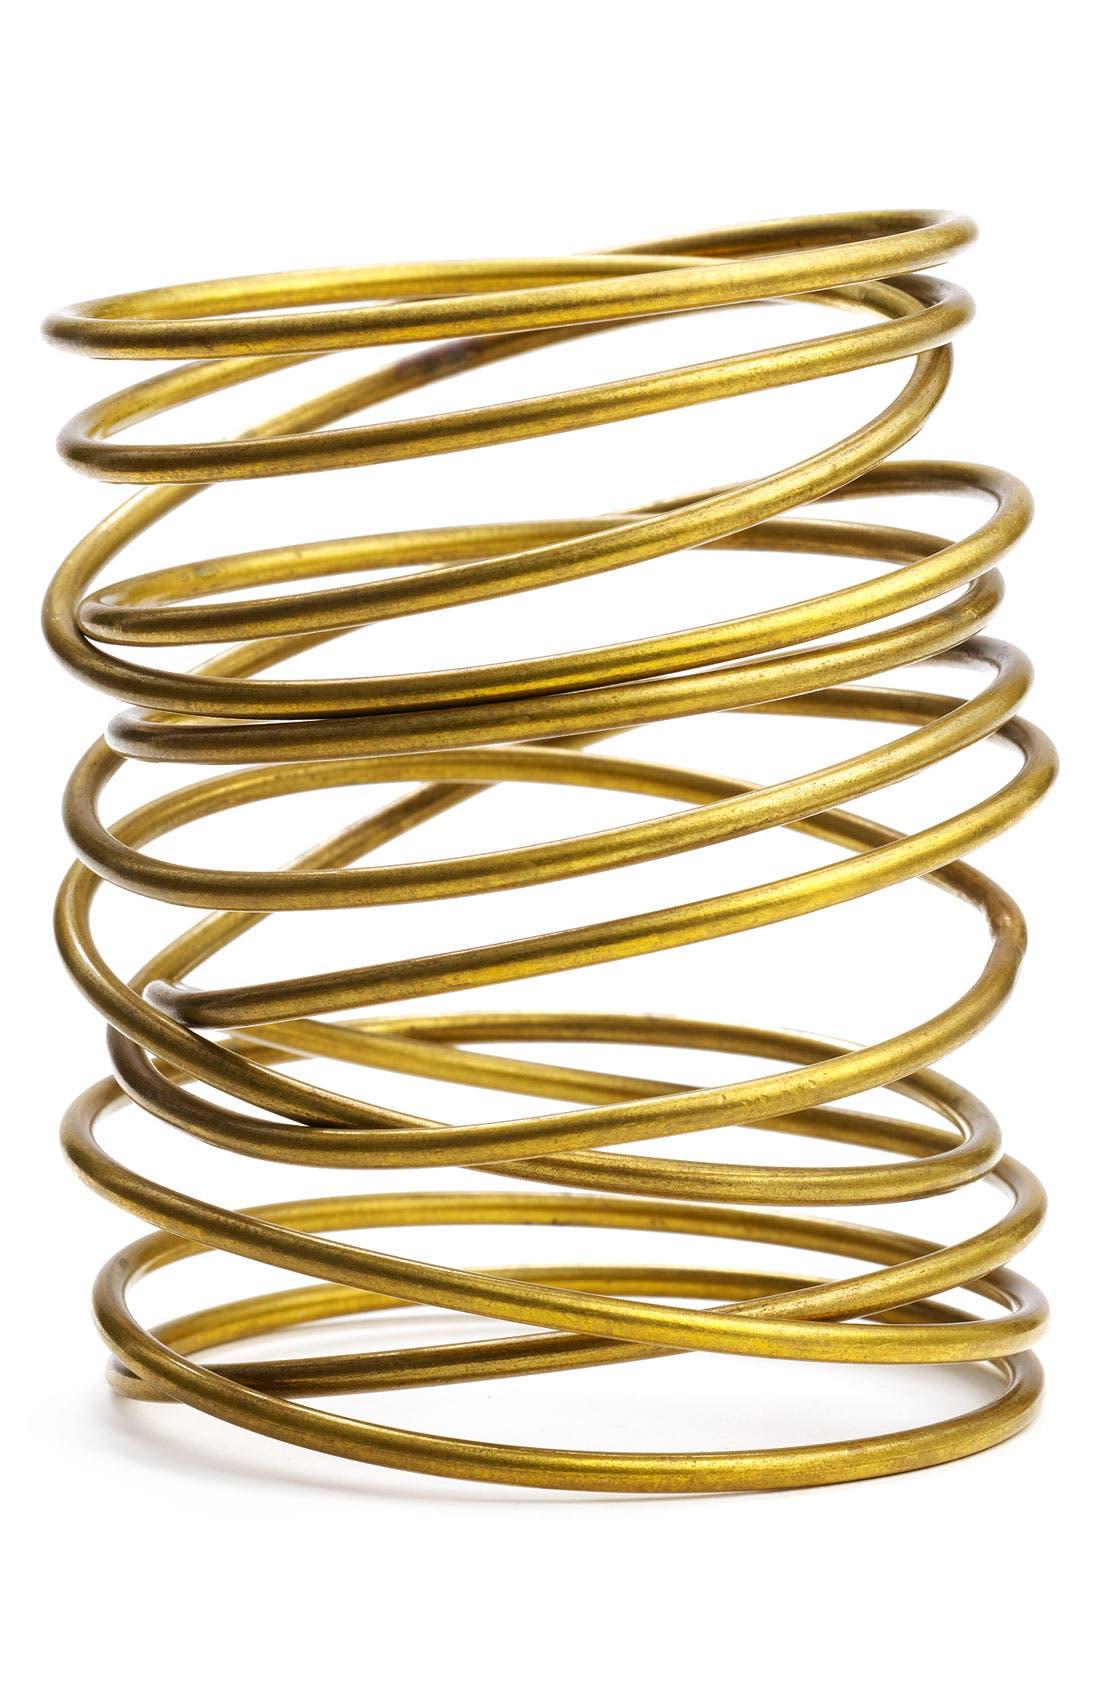 Alternate Image 1 Selected - Kelly Wearstler Twisted Brass Bracelet